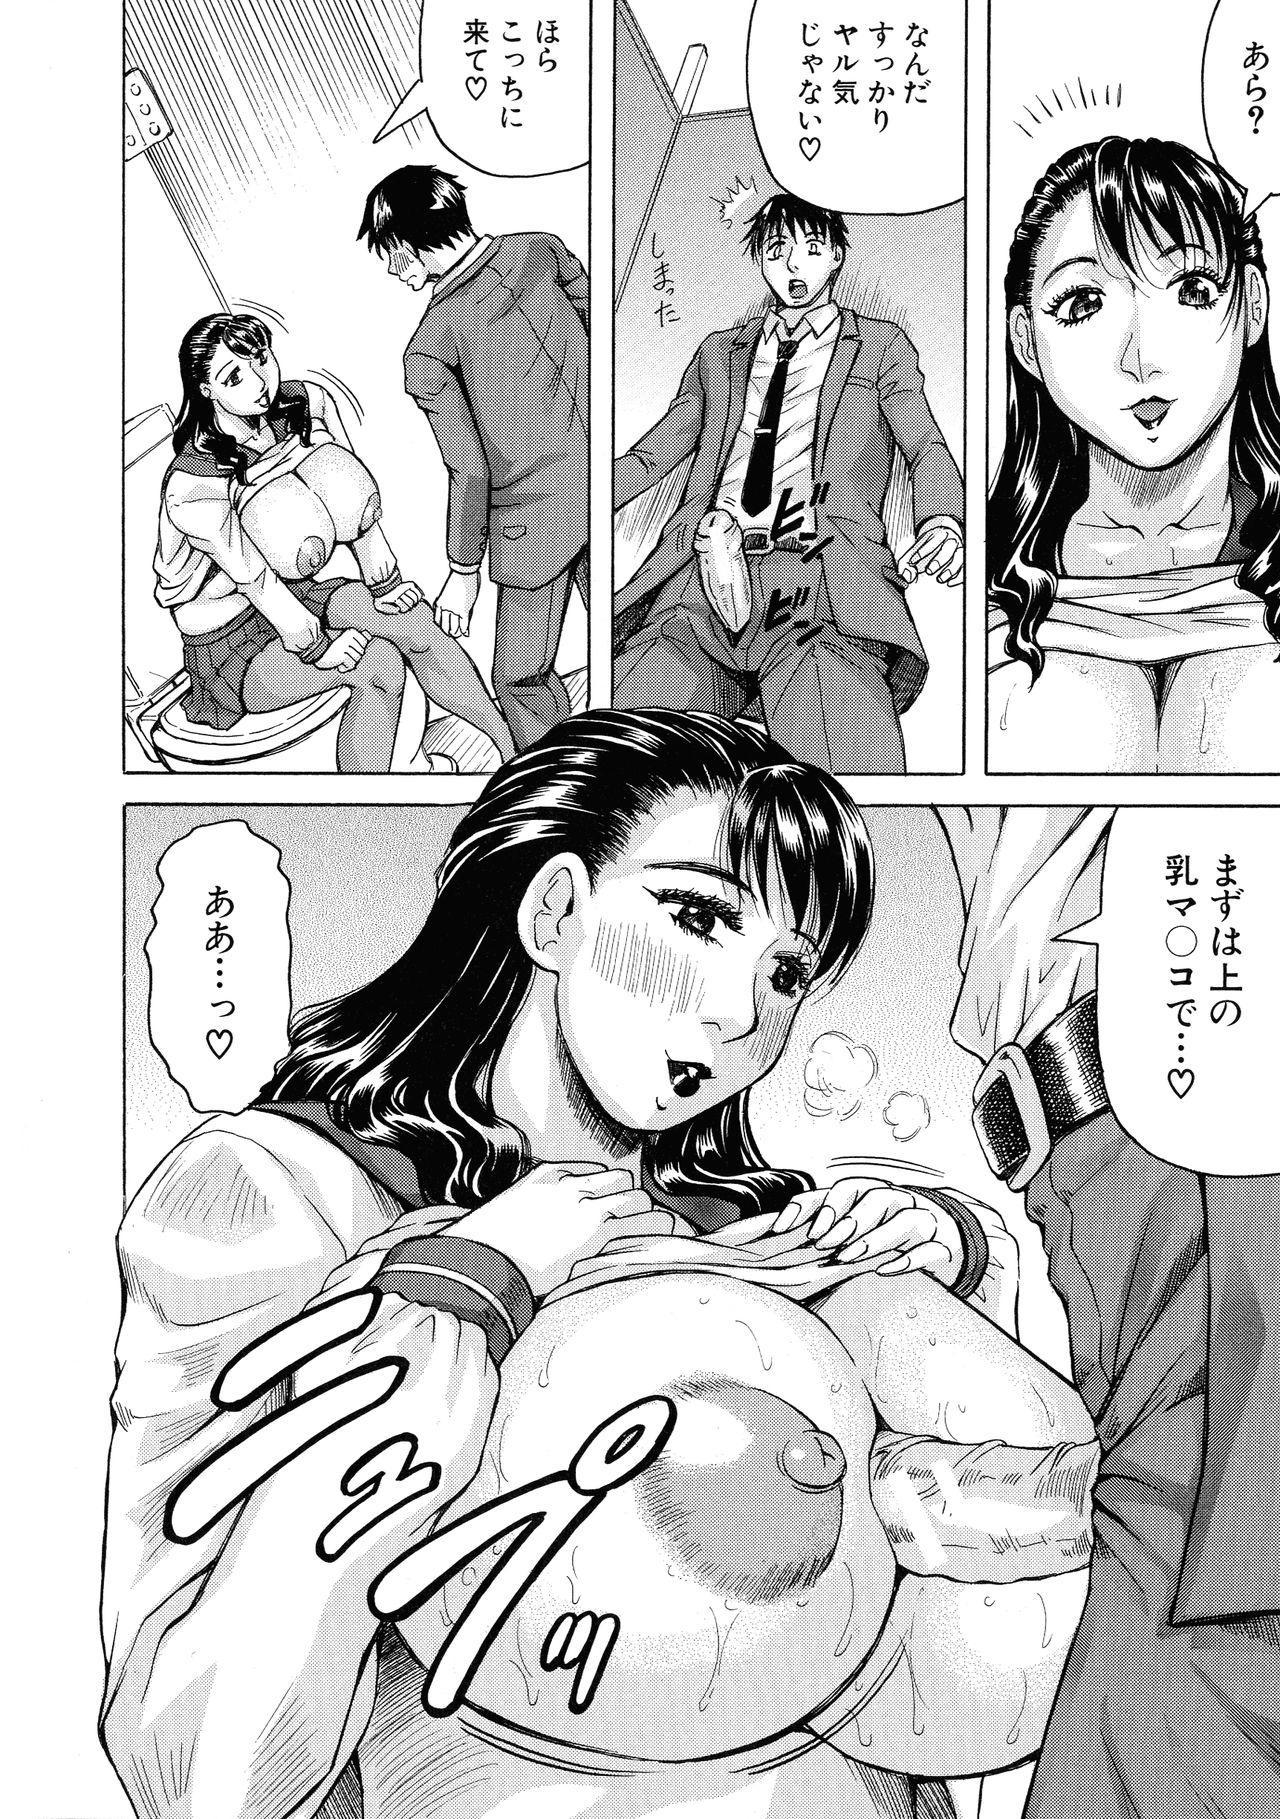 [Jamming] Jukujo Gakuen ~ Classmate wa Zen'in Jukujo ~ Okiniiri Touroku 23